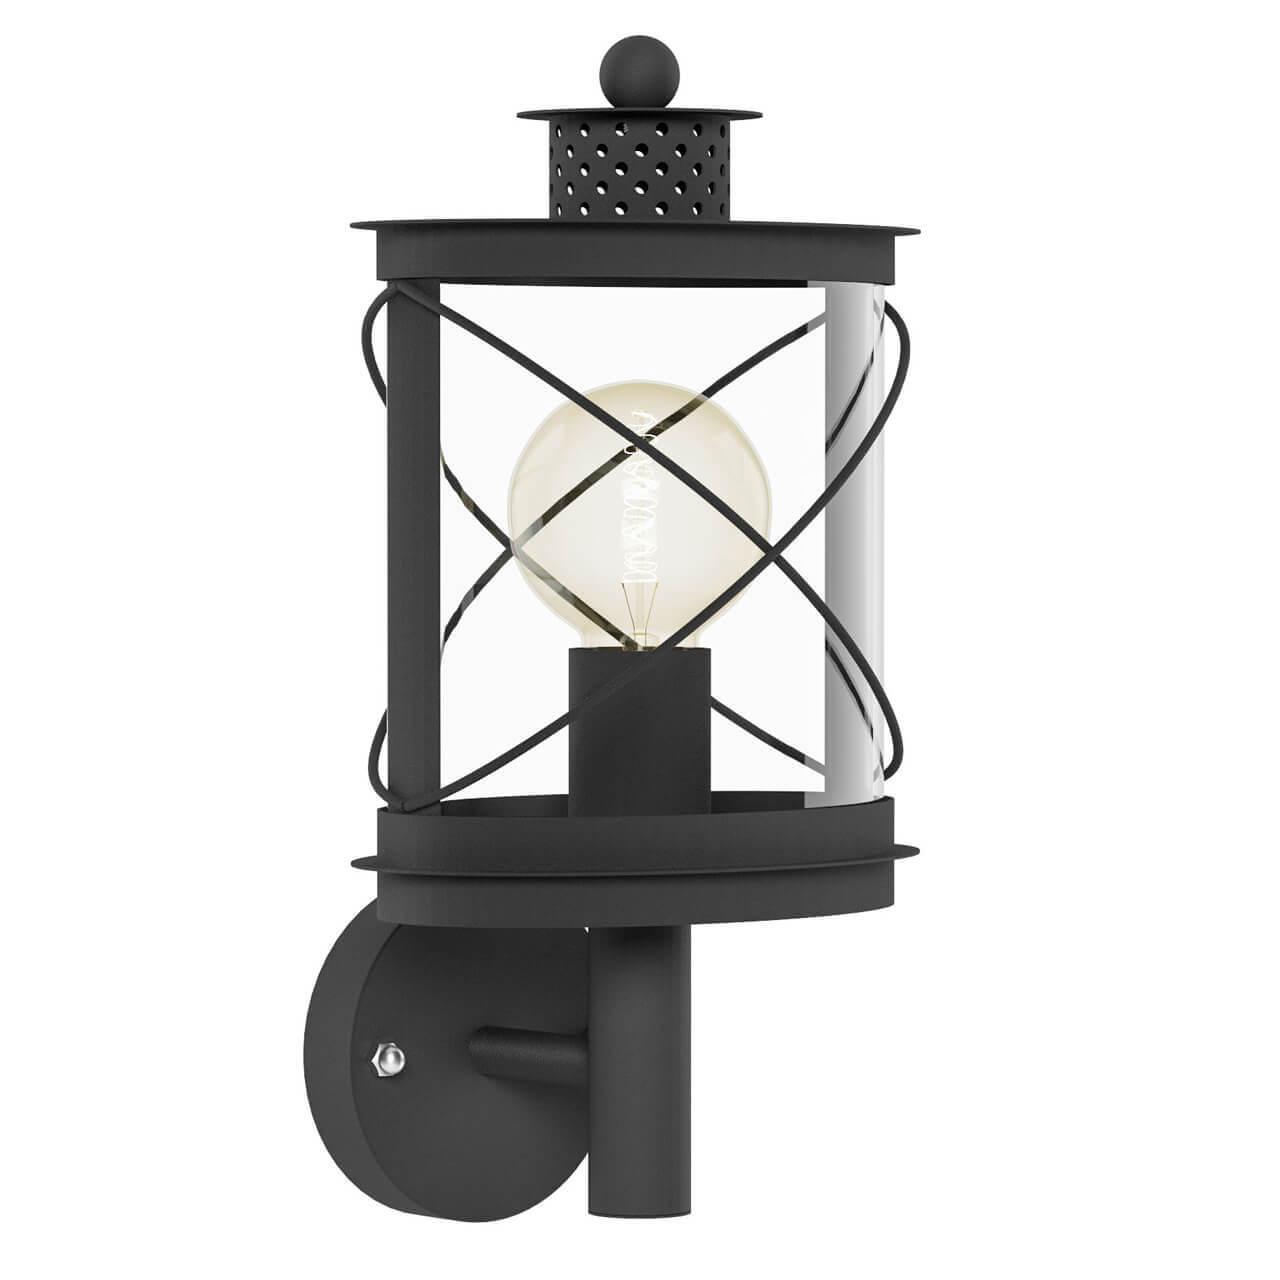 Светильник Eglo 94842 Hilburn eglo светильник уличный hilburn 94843